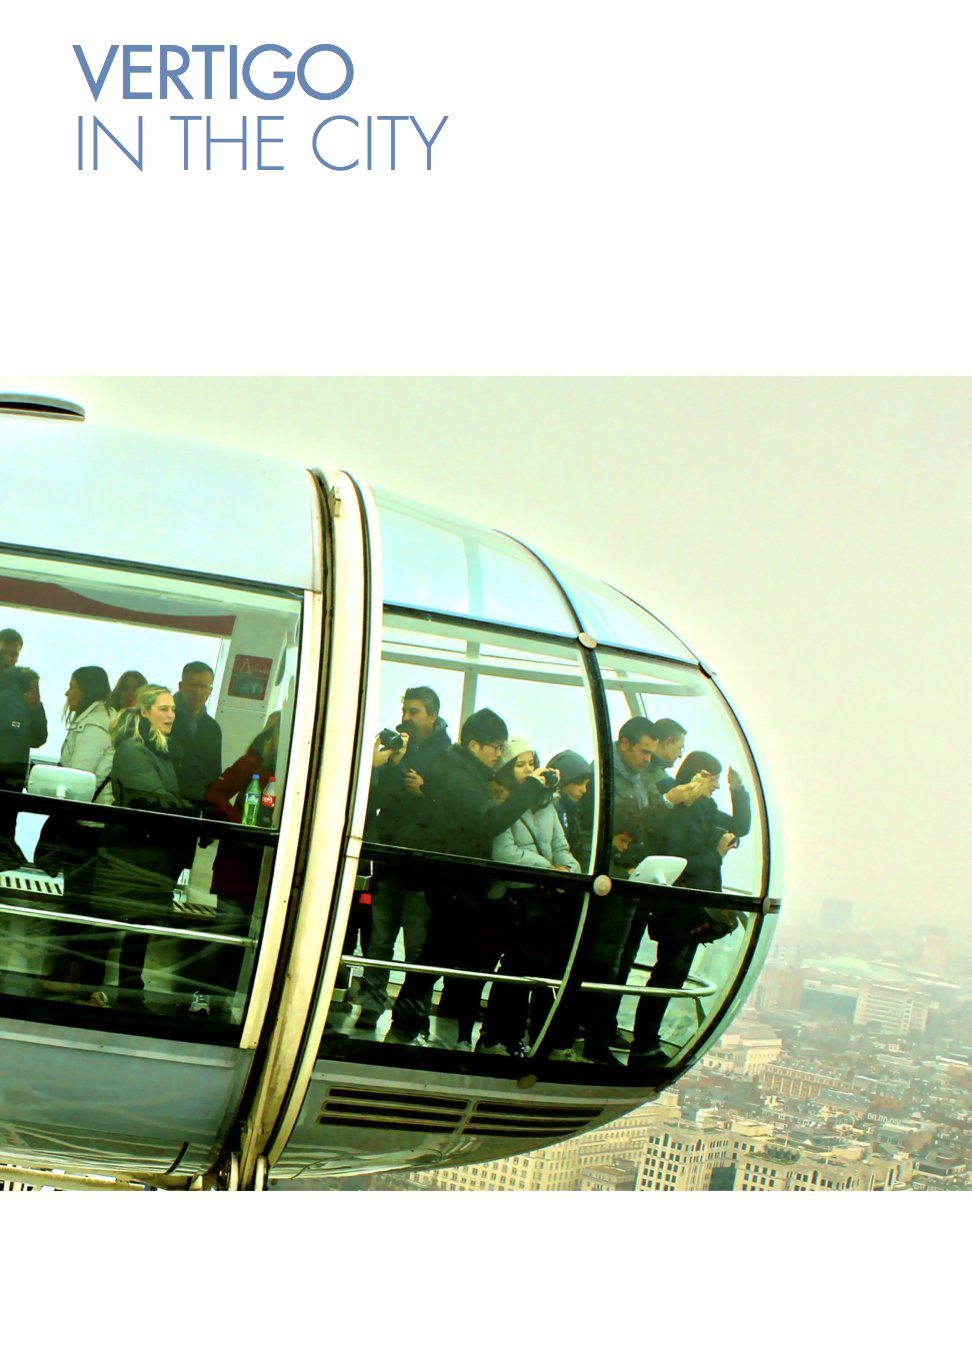 Kane and Deriu (eds) (2015) Vertigo in the City: Conversations between the Humanities, Arts and Sciences